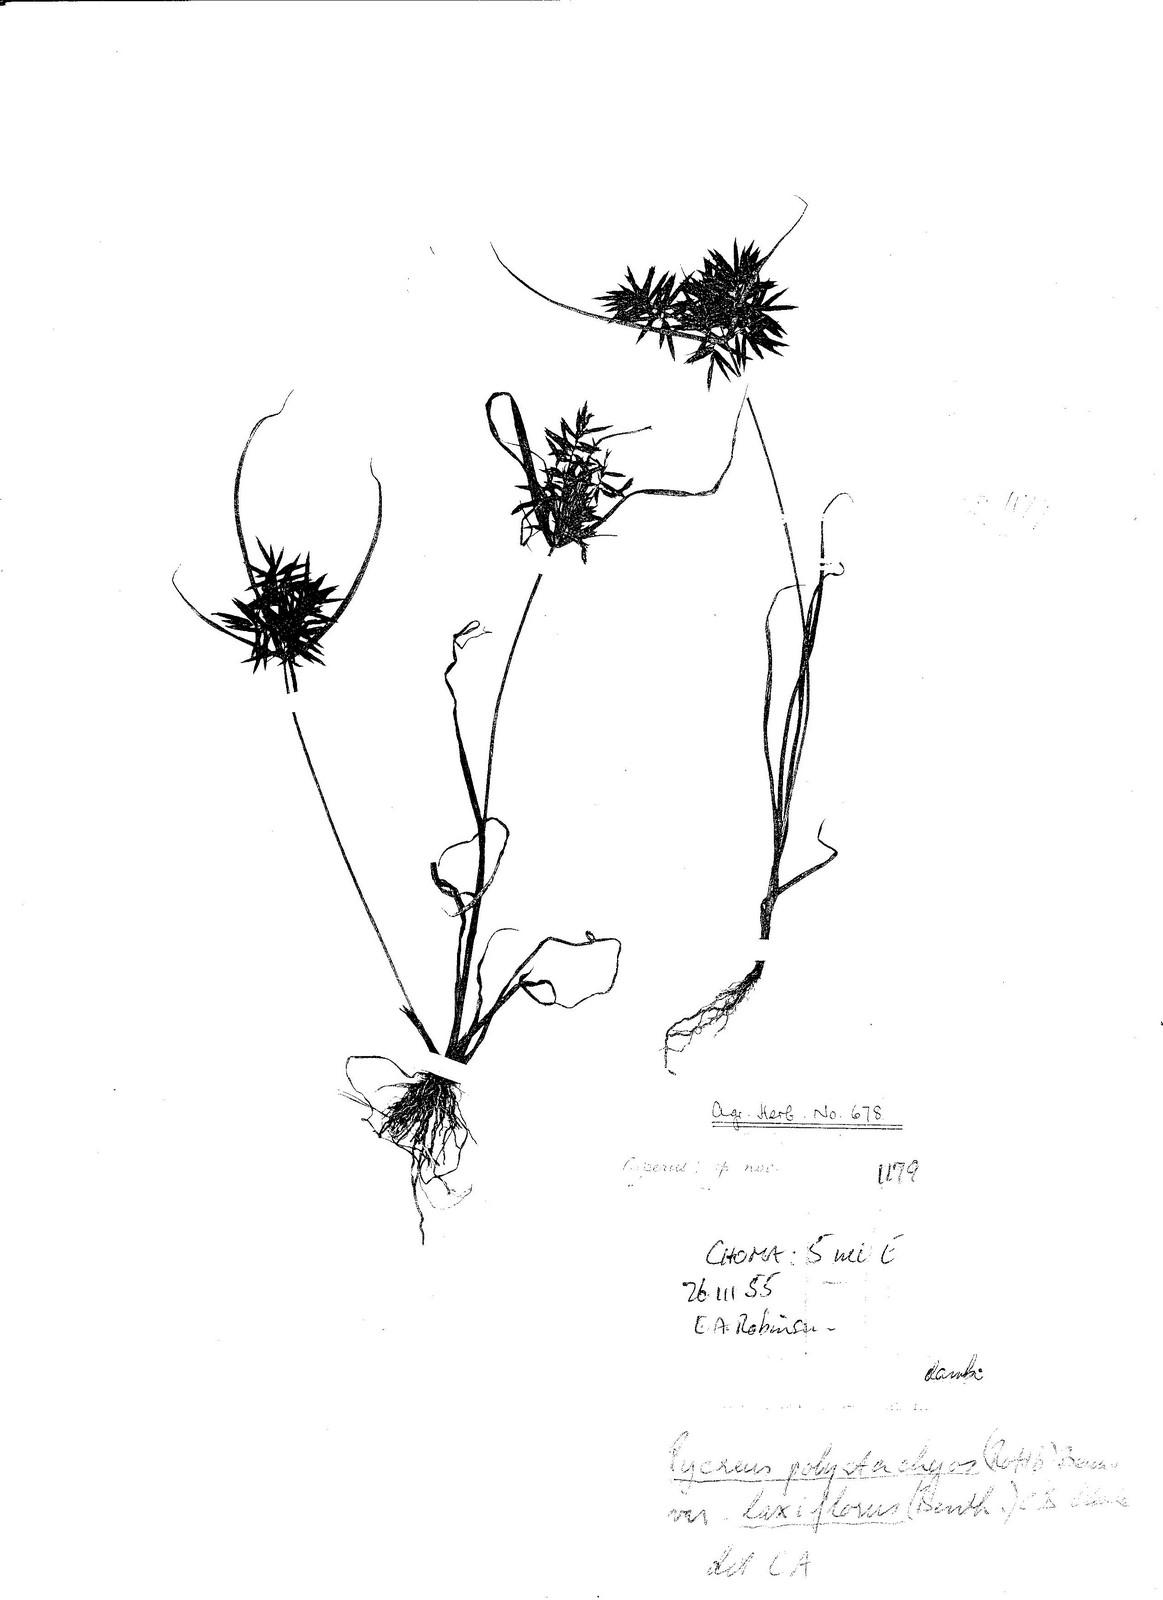 Pycreus polystachyos var. laxiflorus